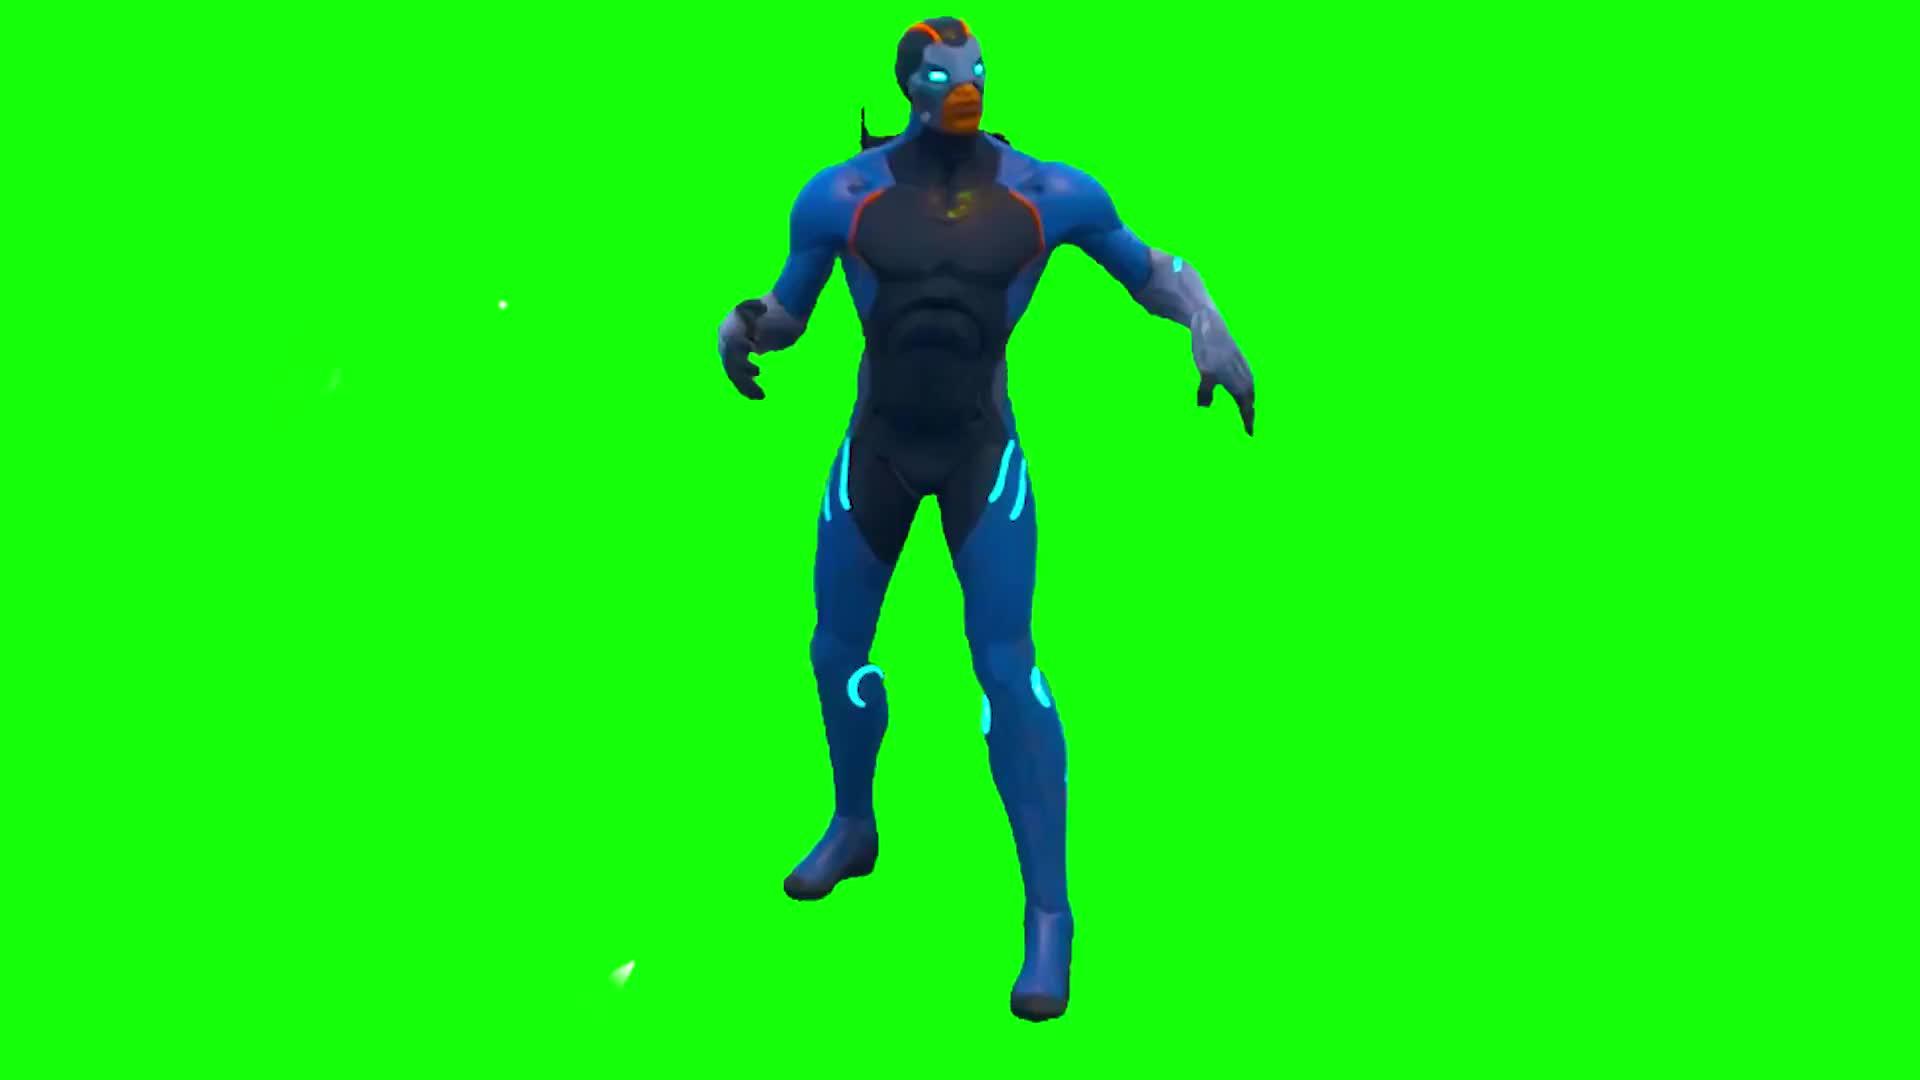 Fortnite Season 4 New Skin Green Screen Default Dance Gif Find